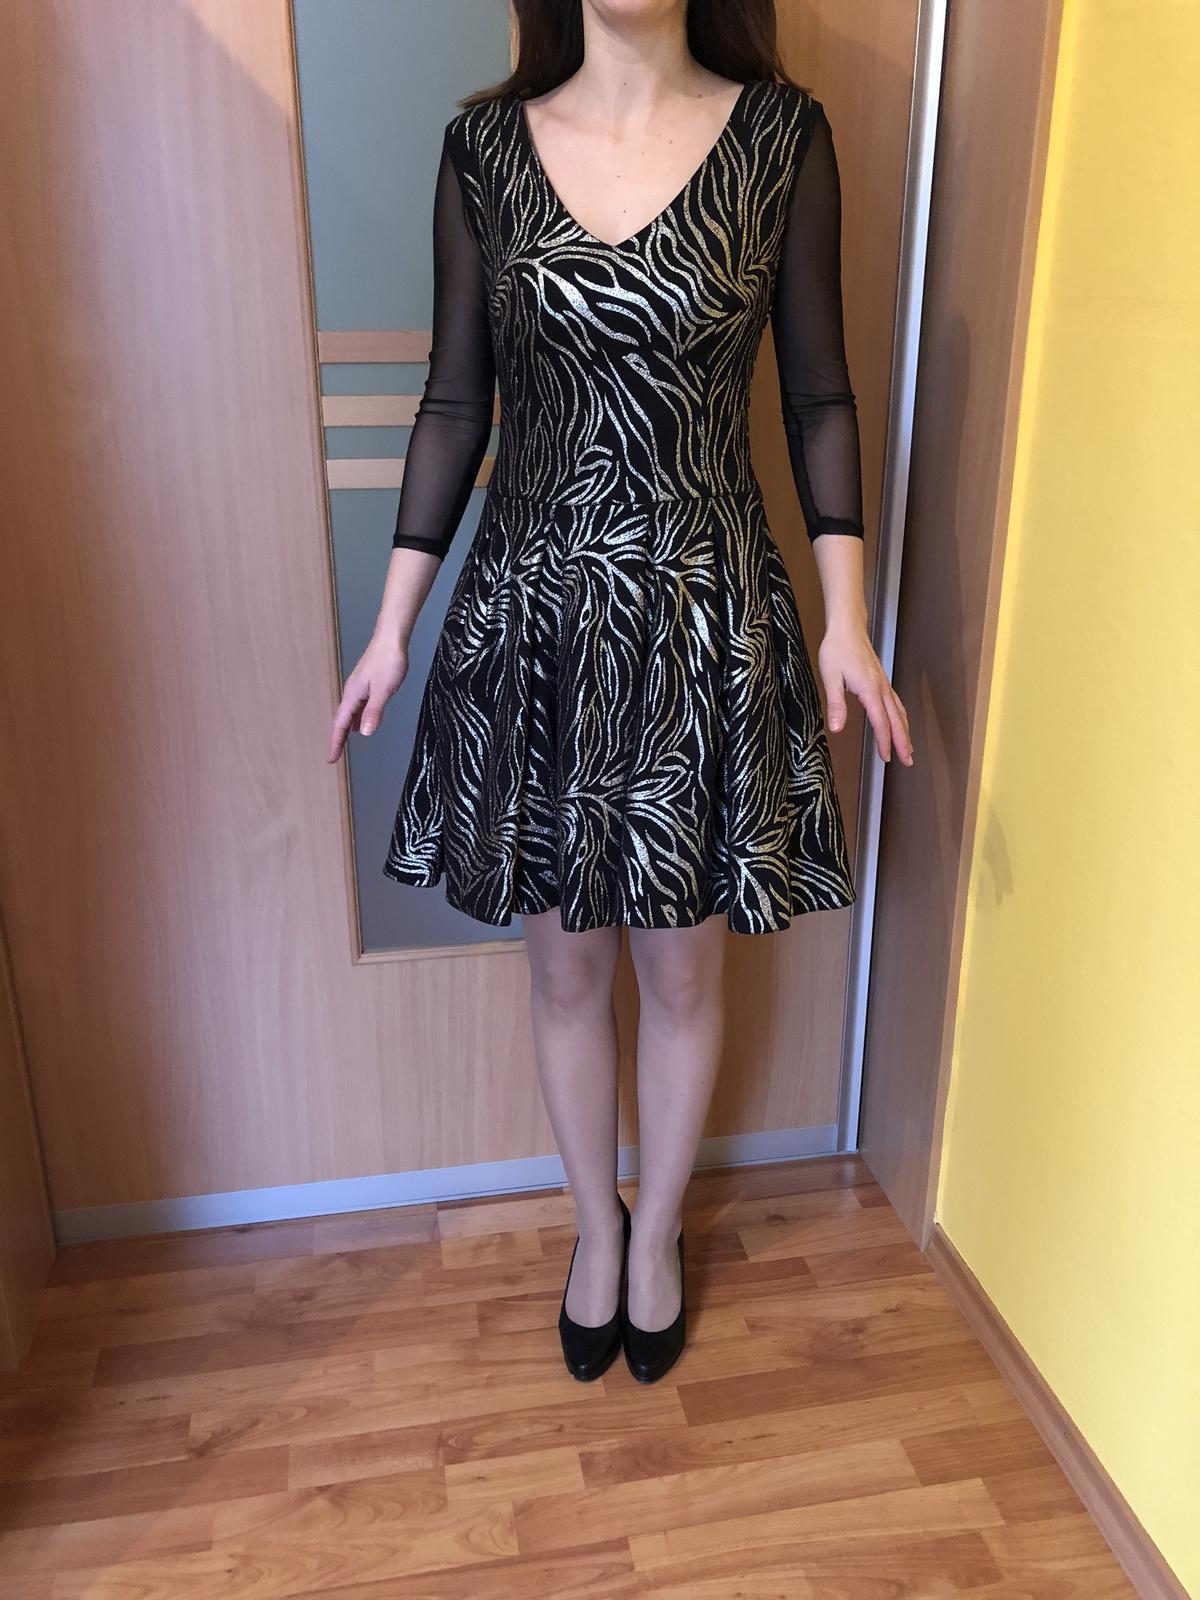 Čiernozlaté šaty - Obrázok č. 1